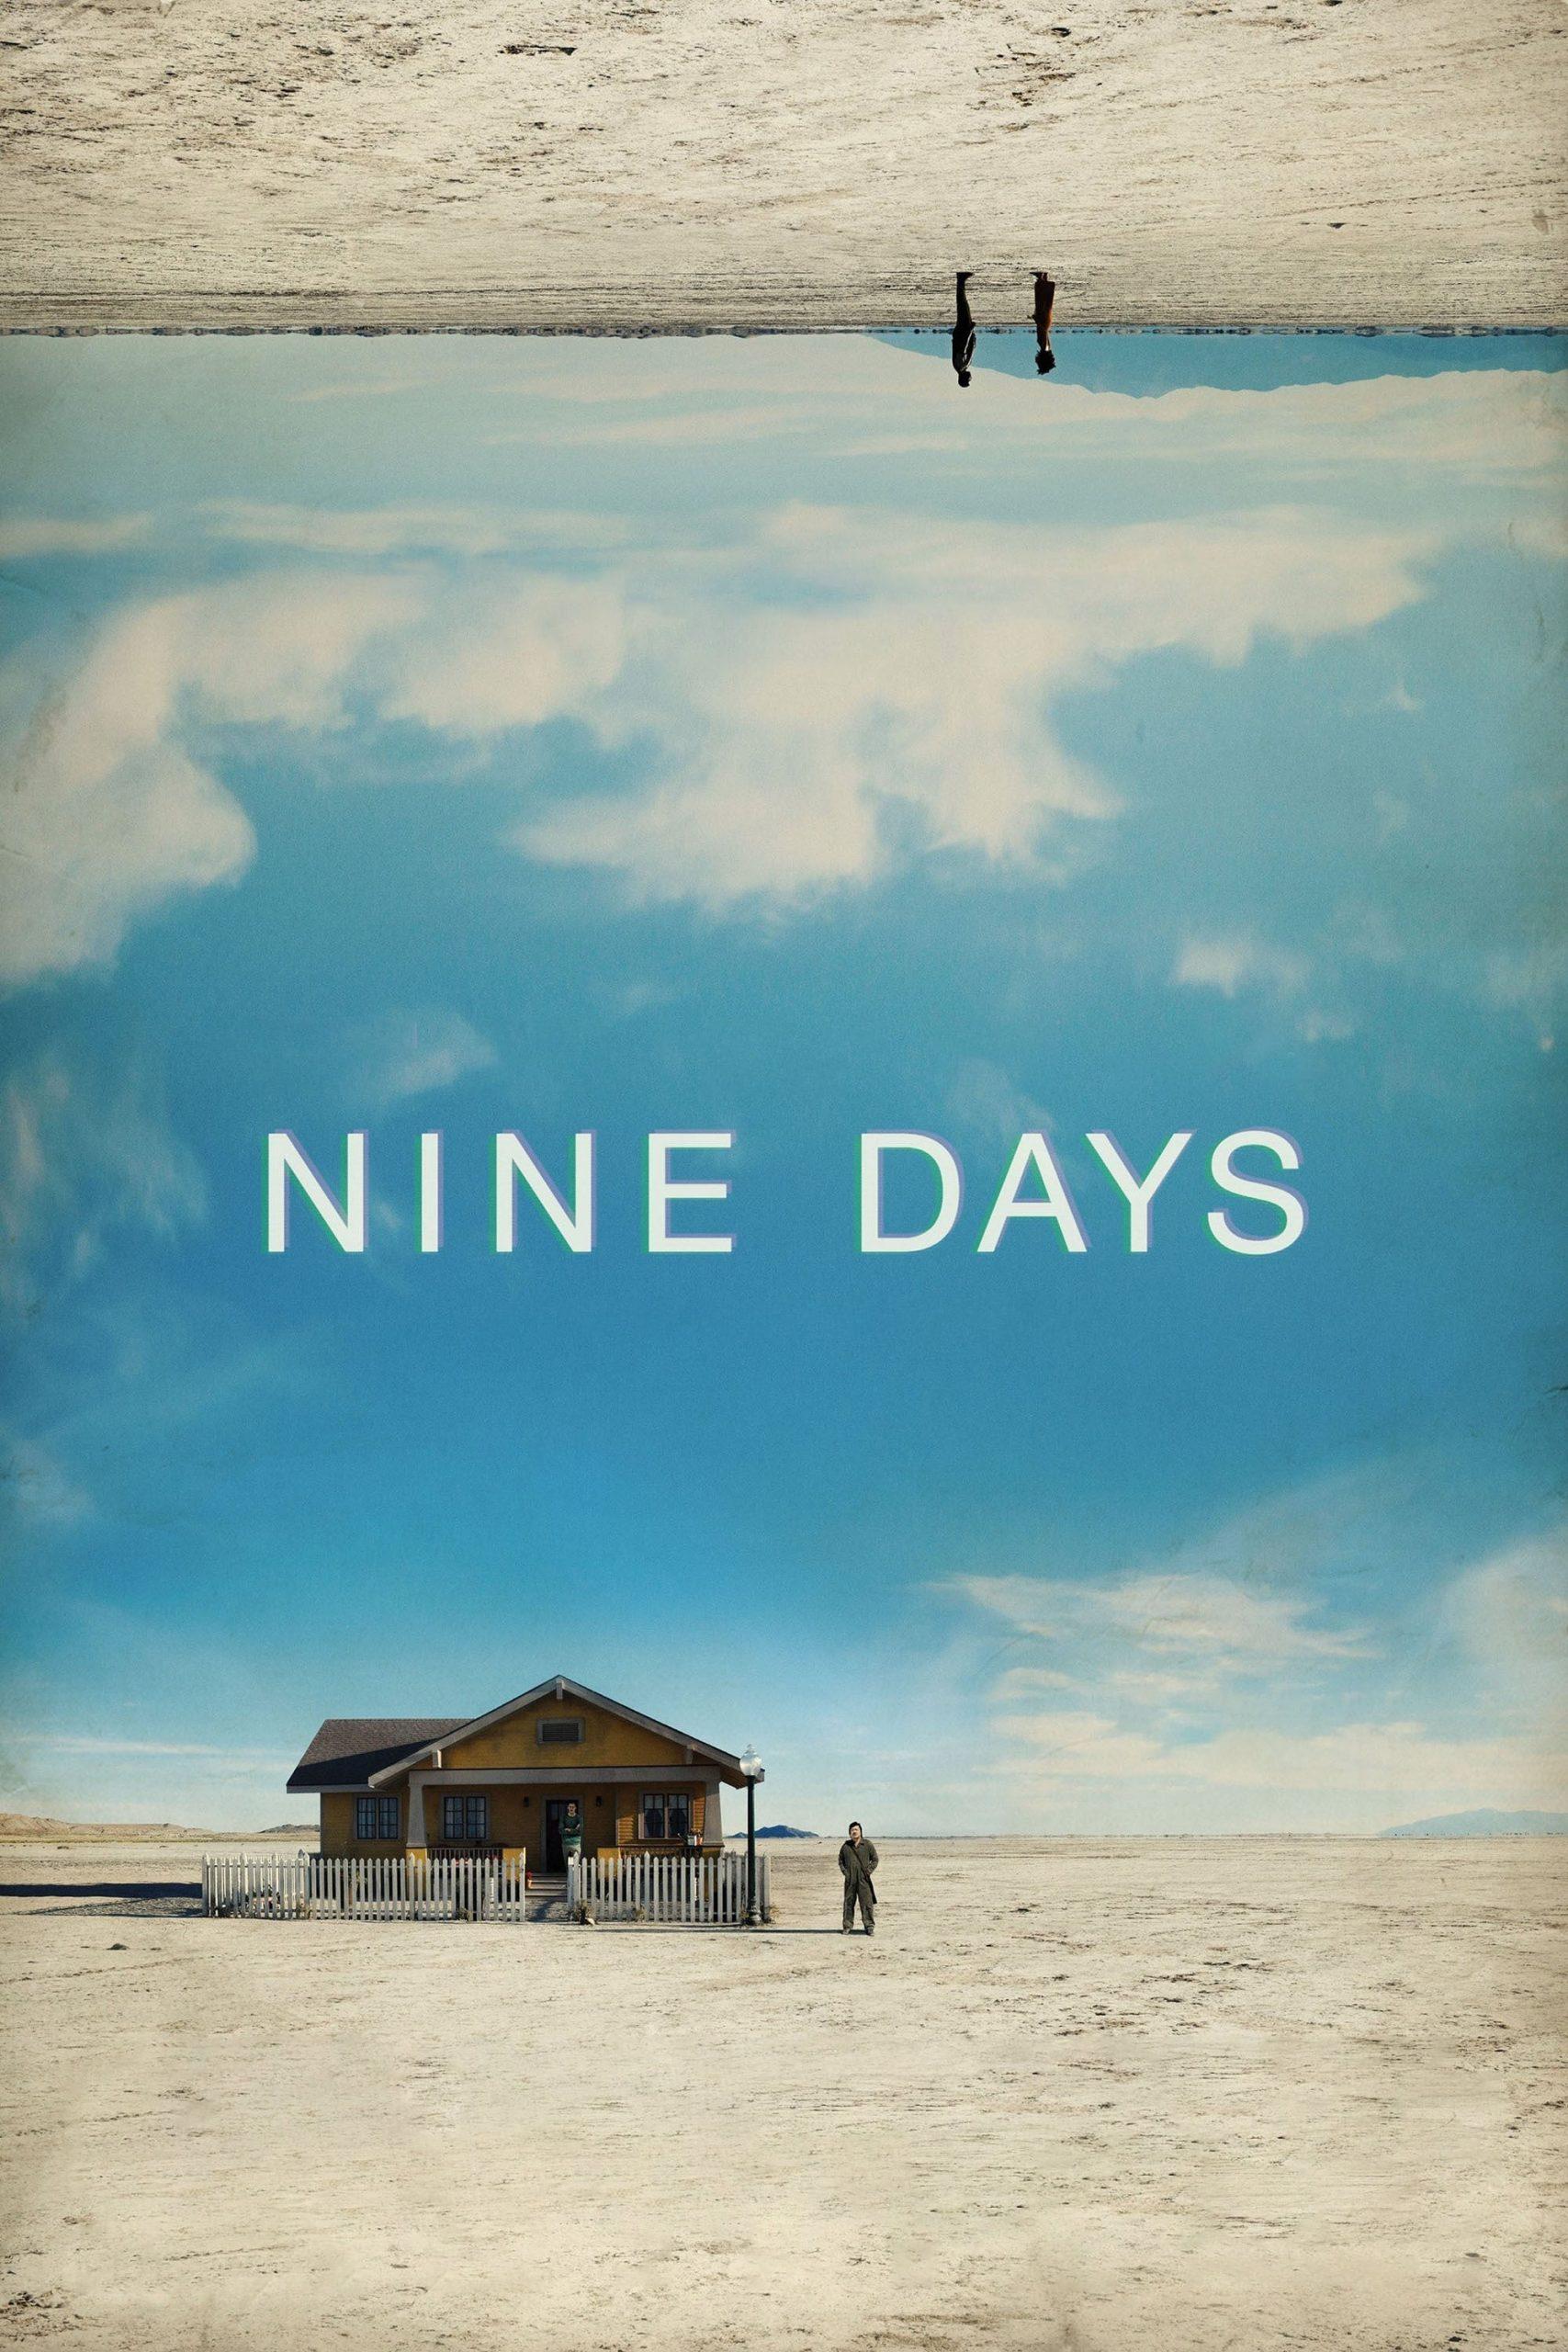 Poster for Nine Days